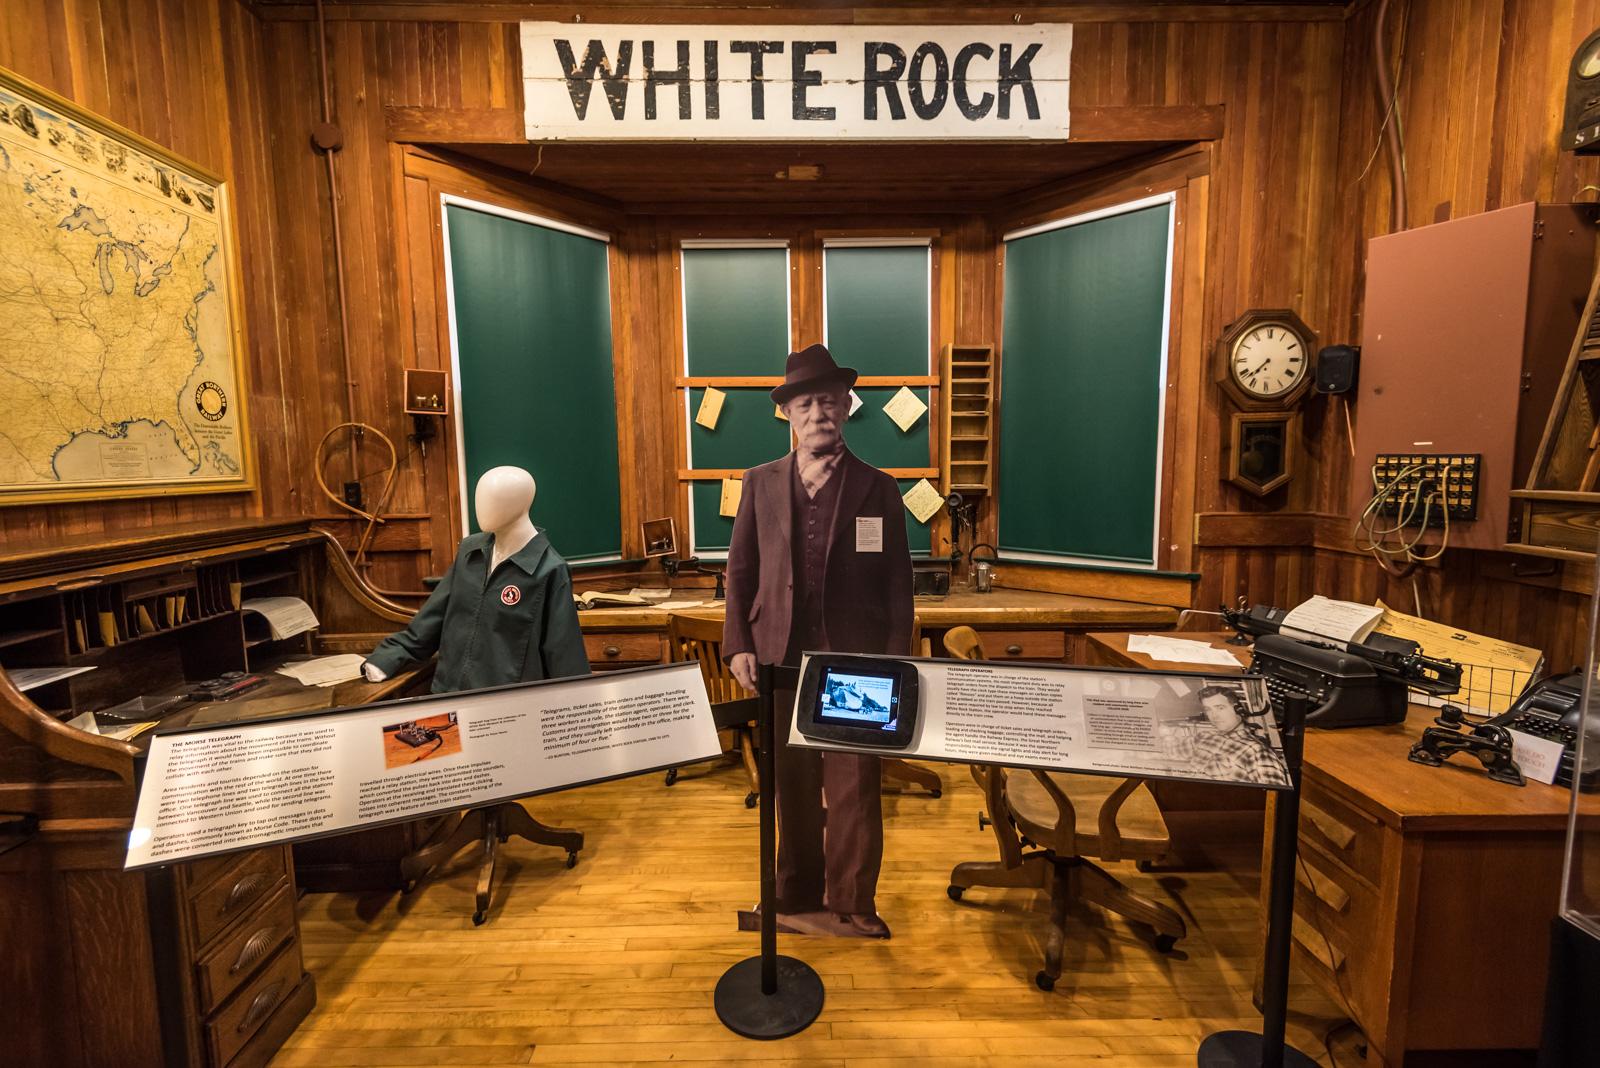 White Rock Museum